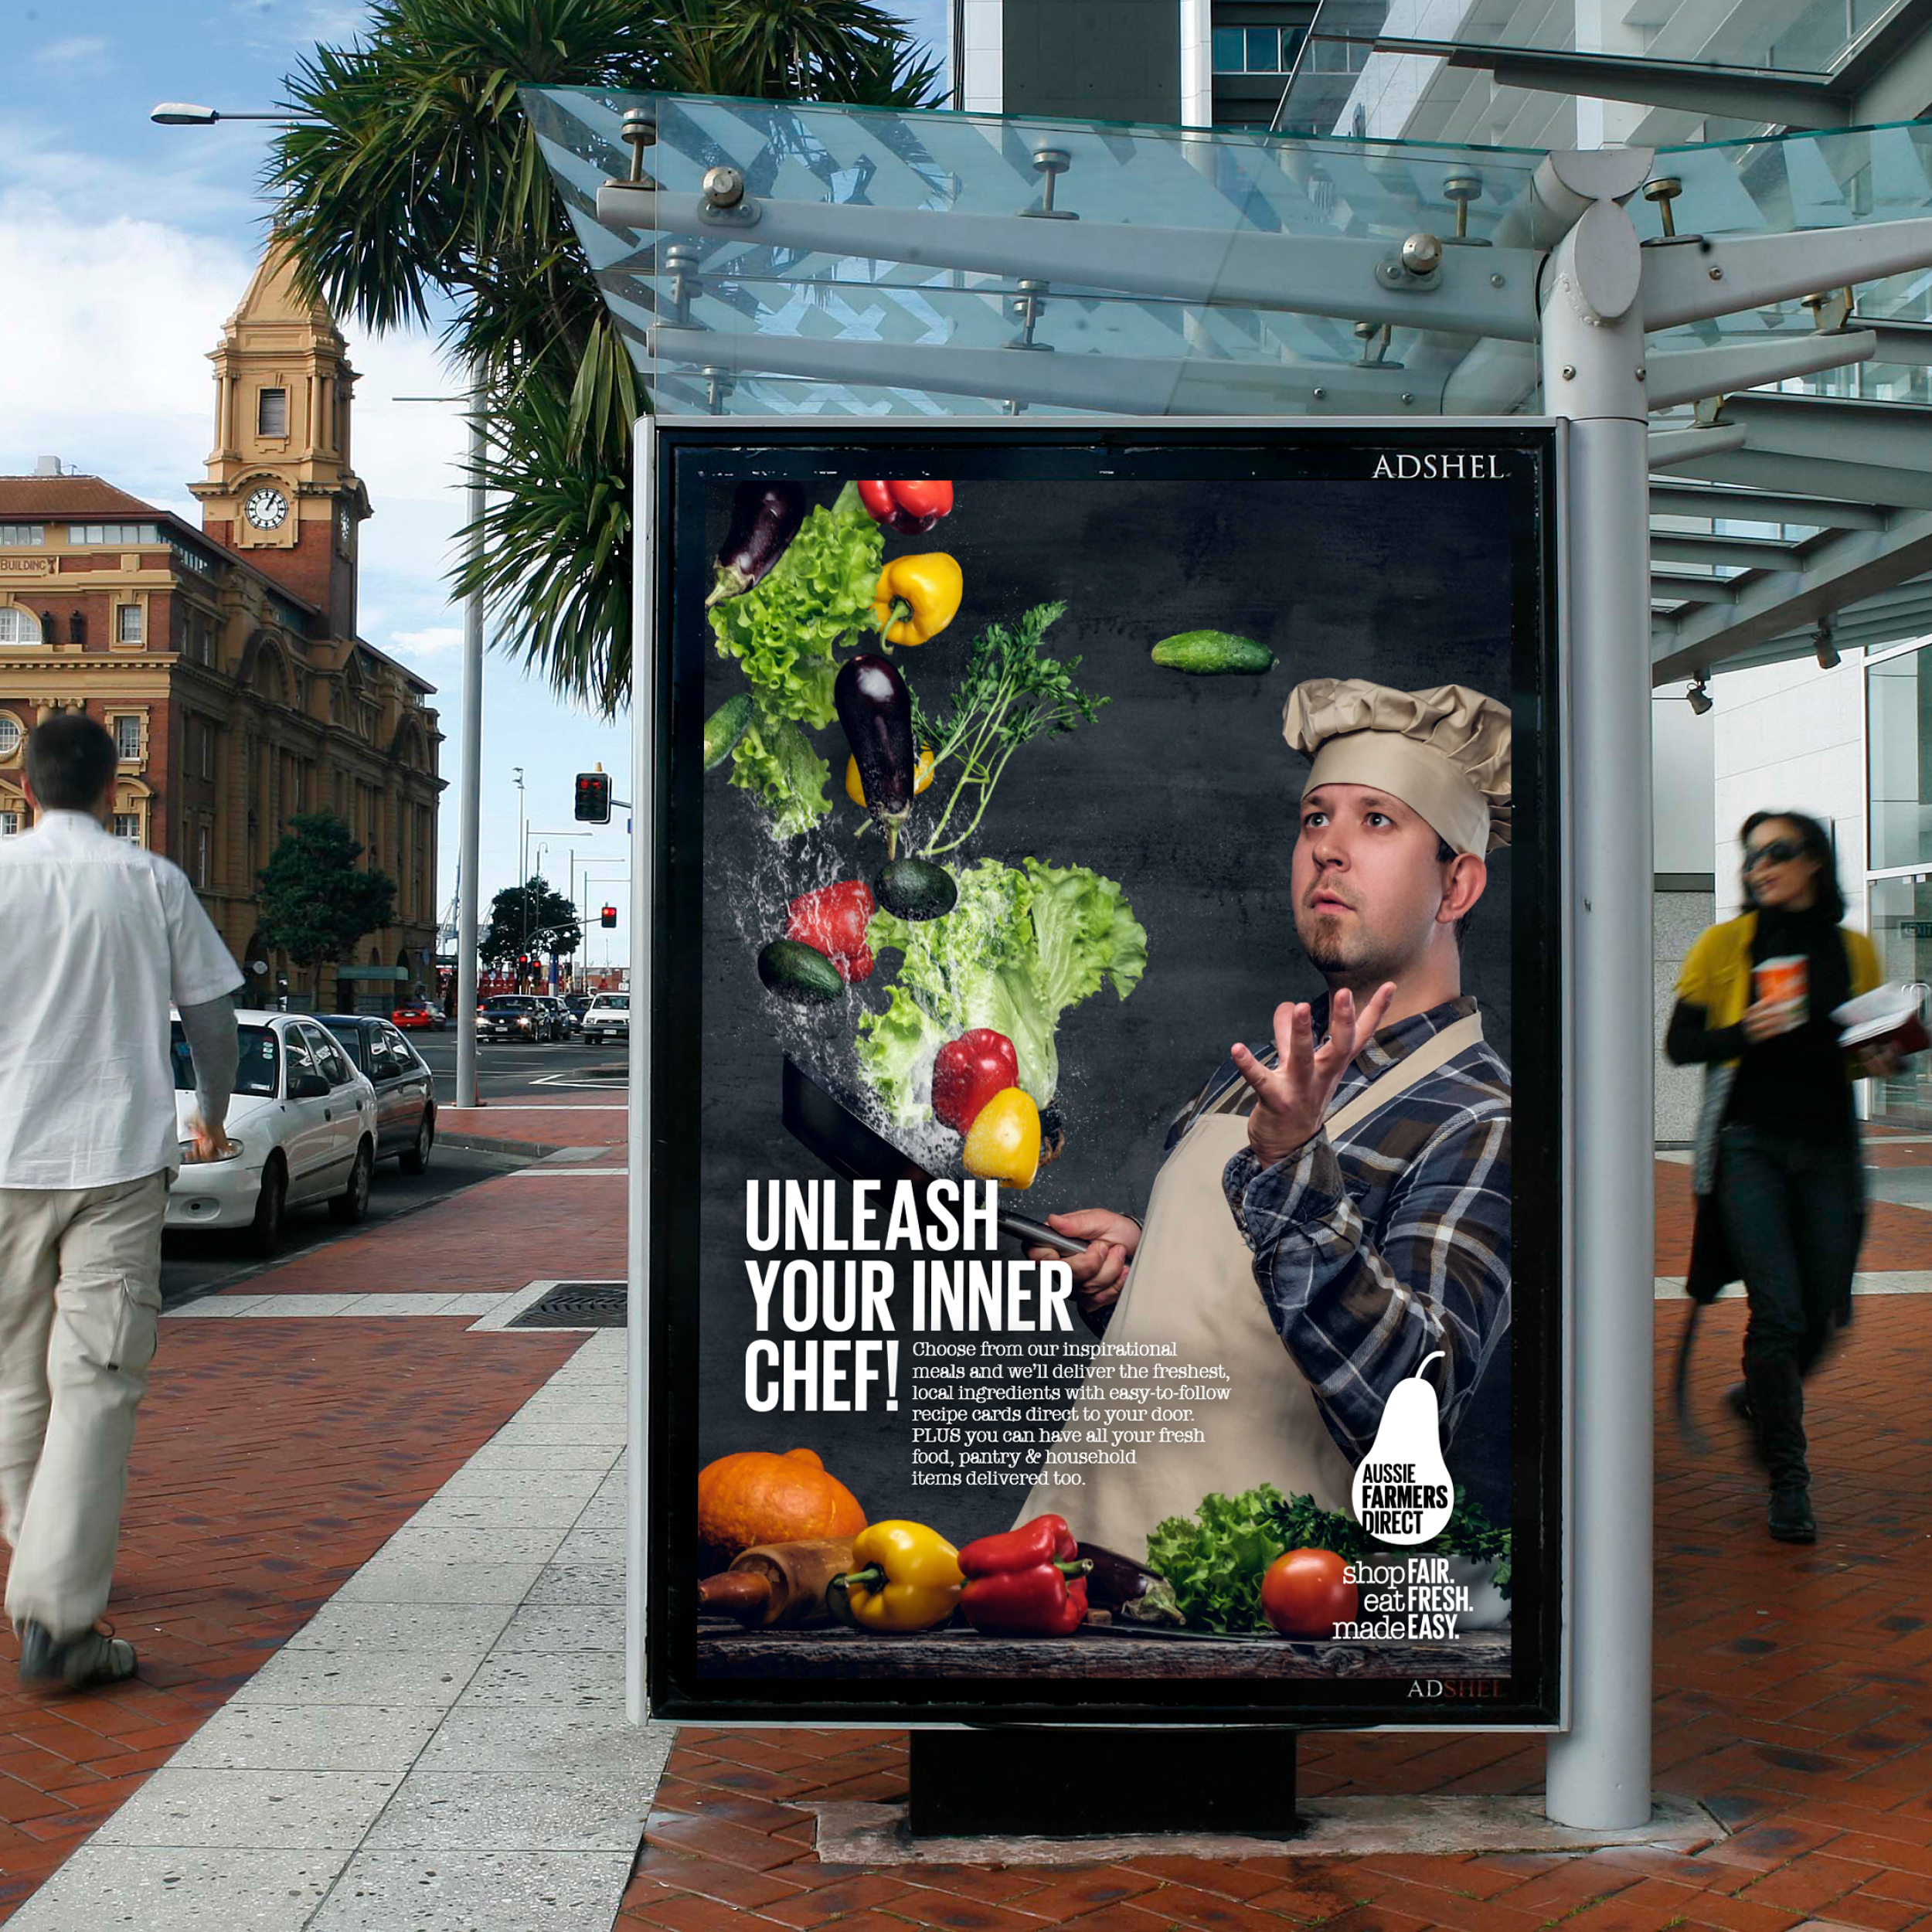 2018-marketing-advertising-2500x2500px-17.jpg